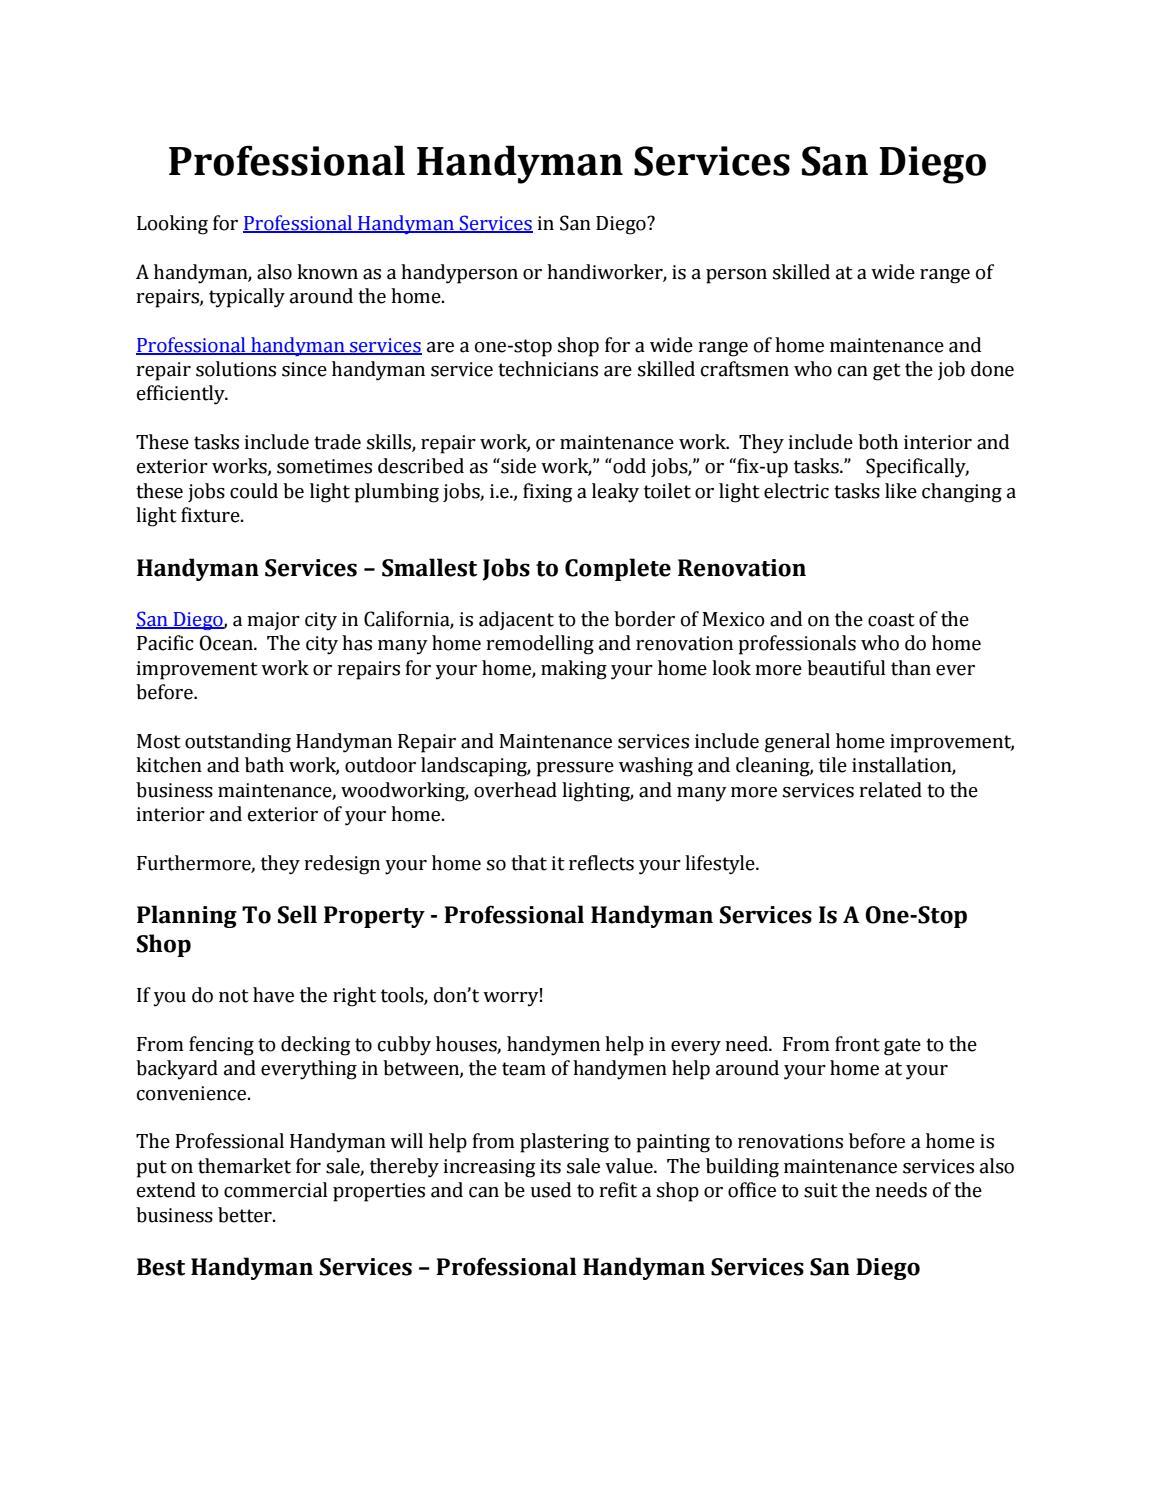 Professional handyman services san diego by Reno Merica - issuu